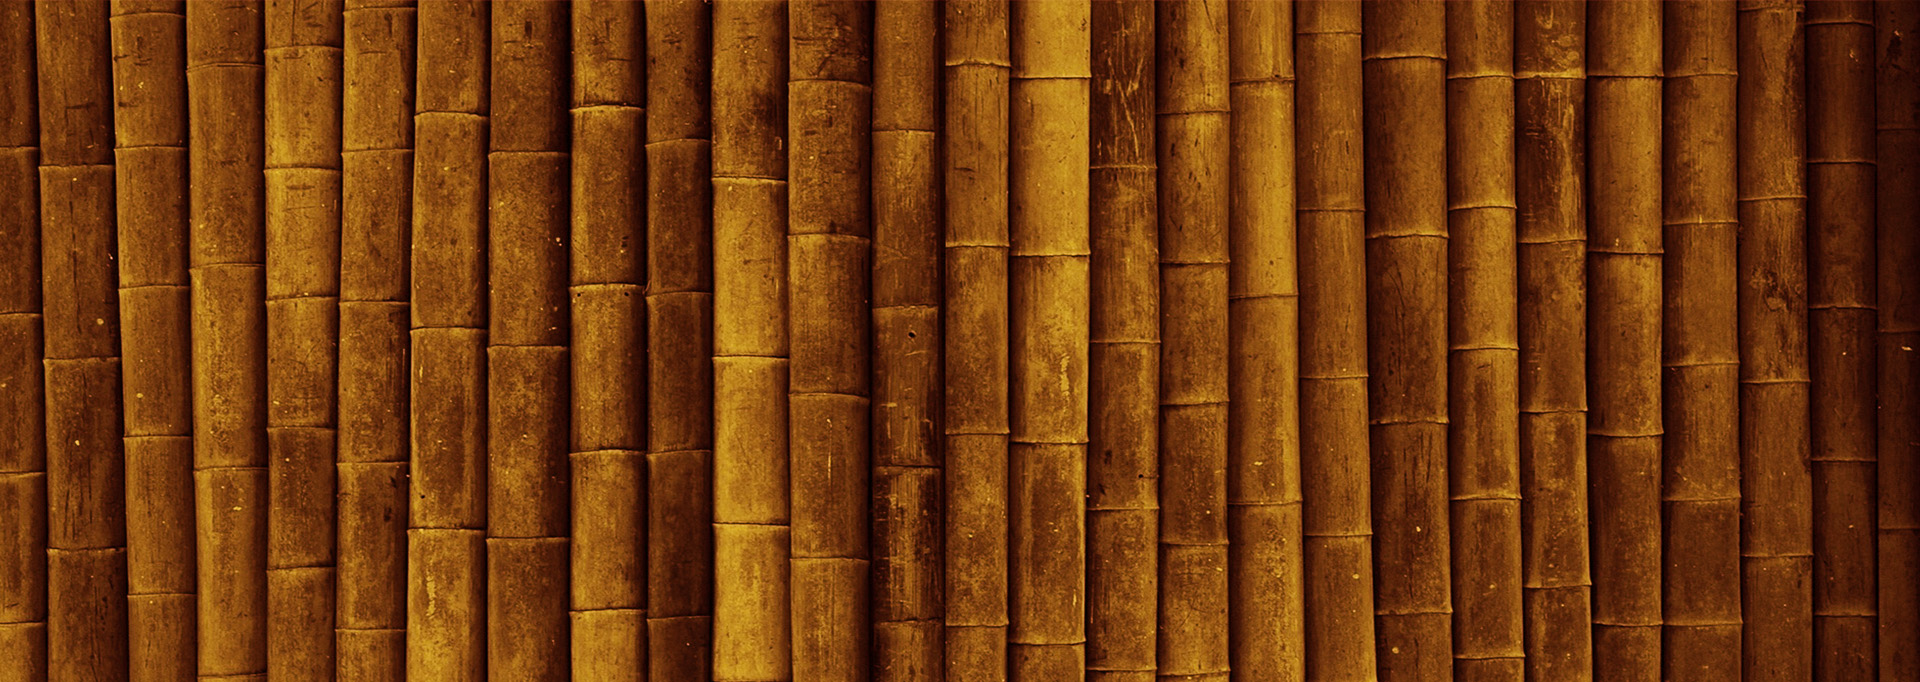 bambu_background